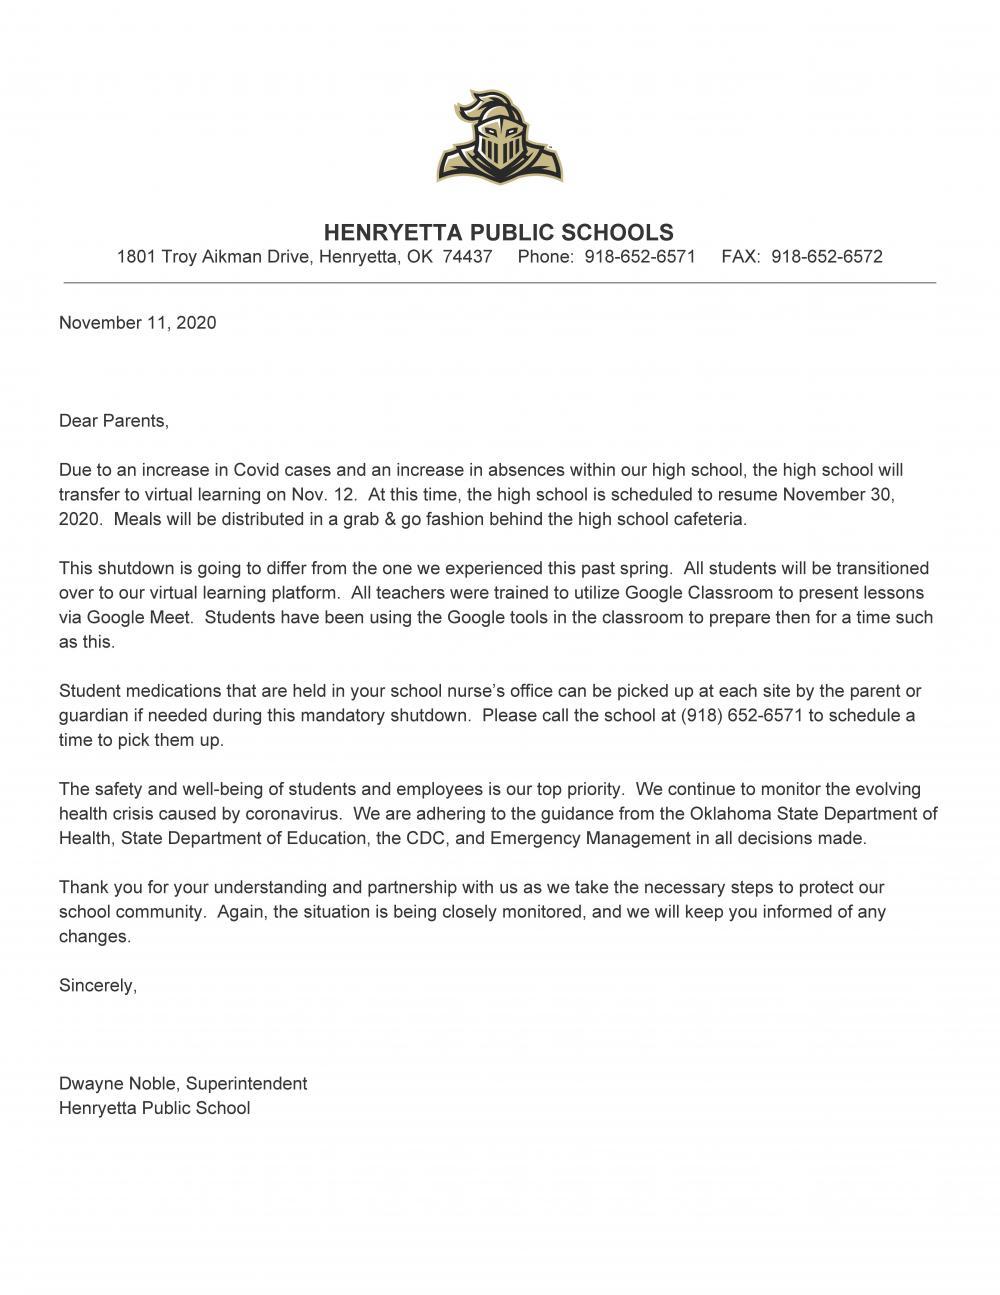 Updated HS Covid Closure